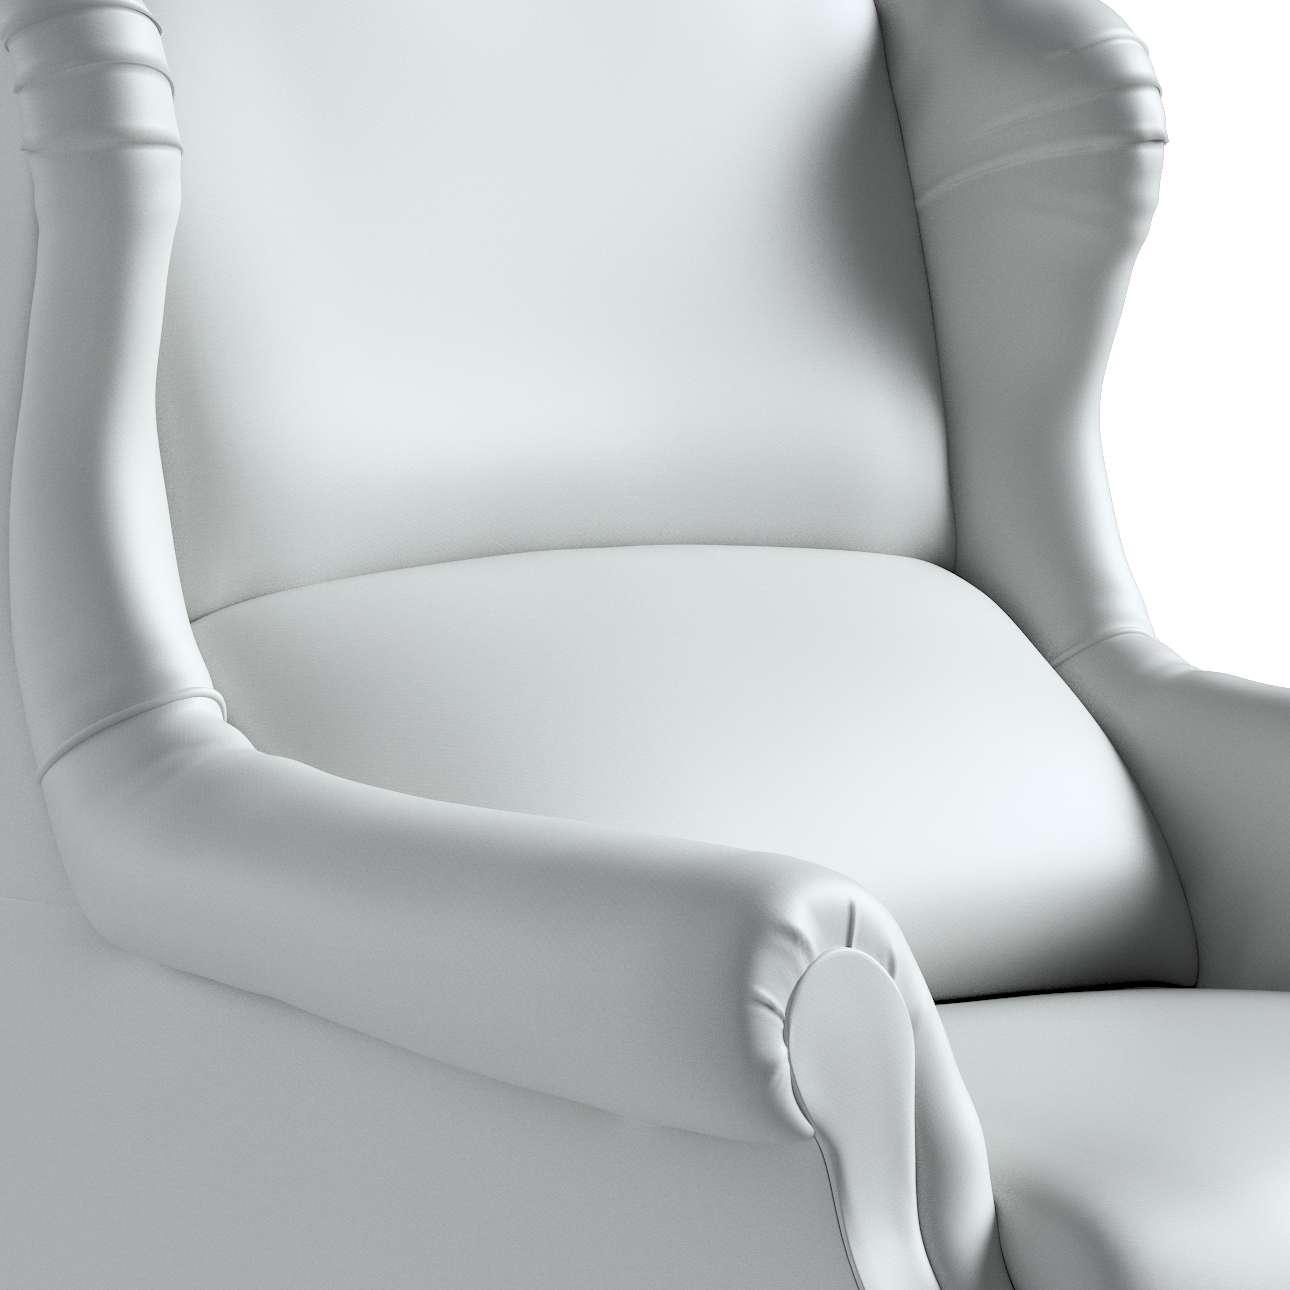 Fotel Unique w kolekcji Damasco, tkanina: 141-77